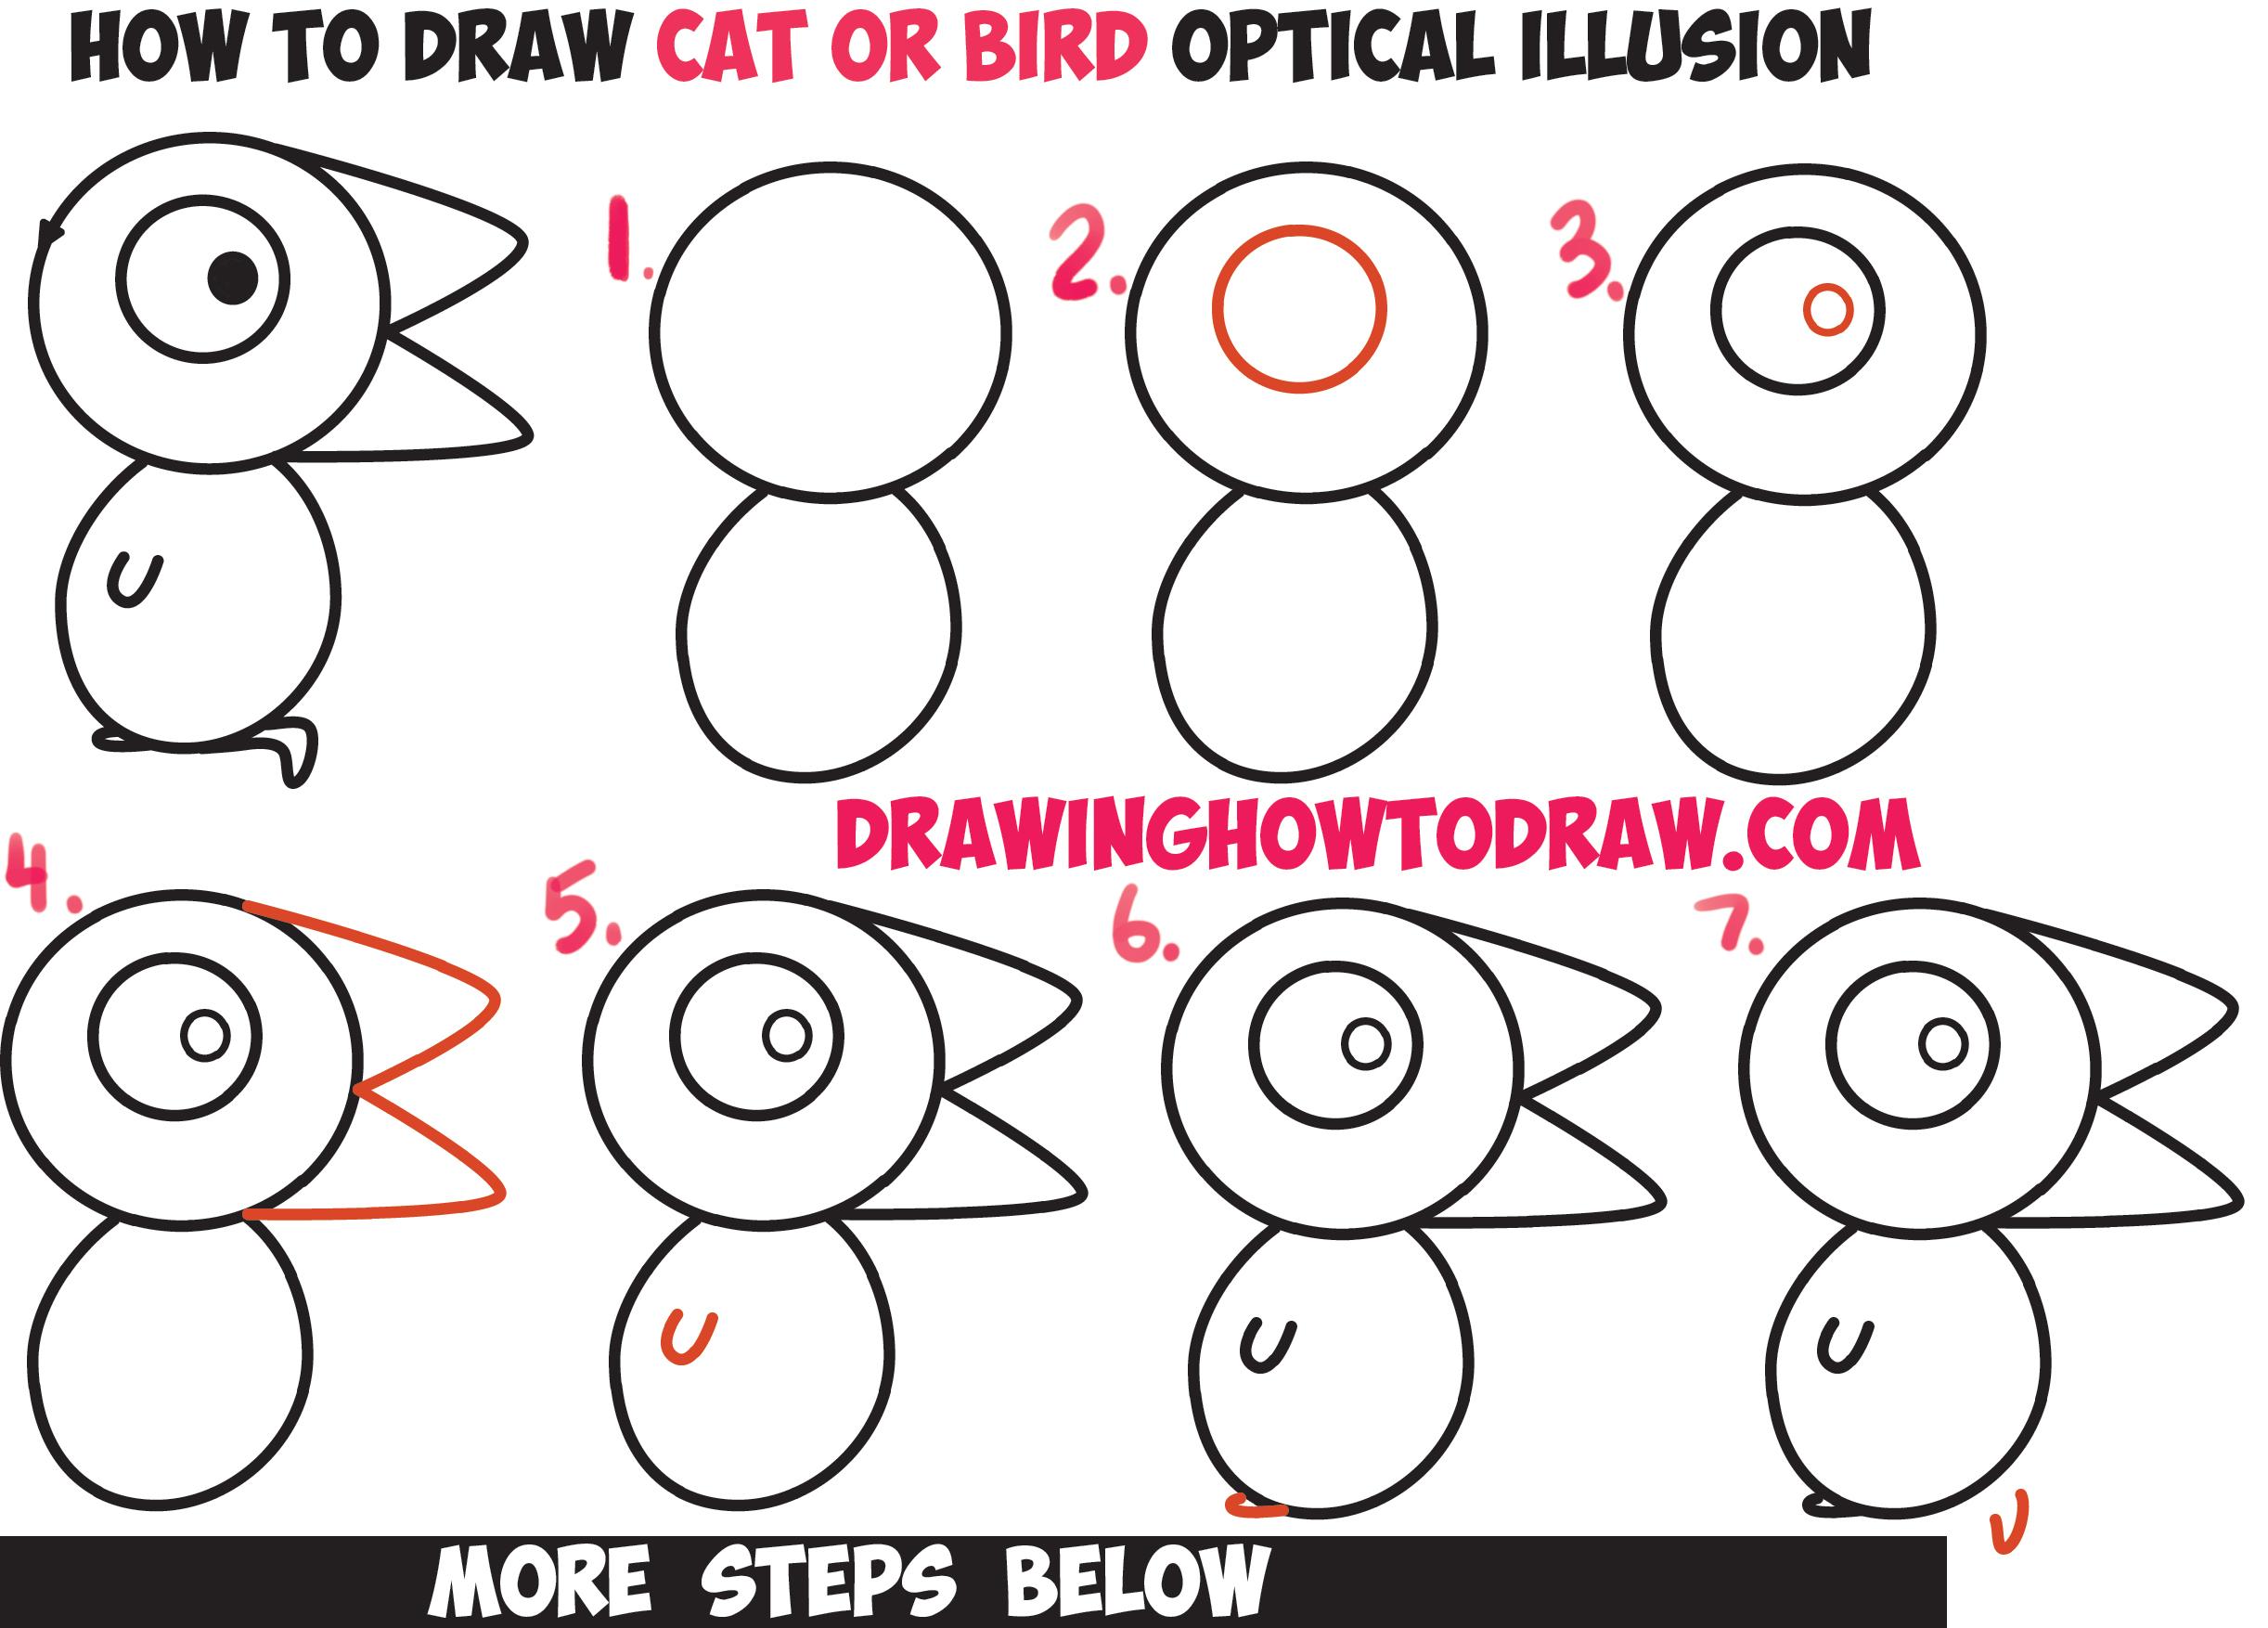 Drawn optical illusion ninja